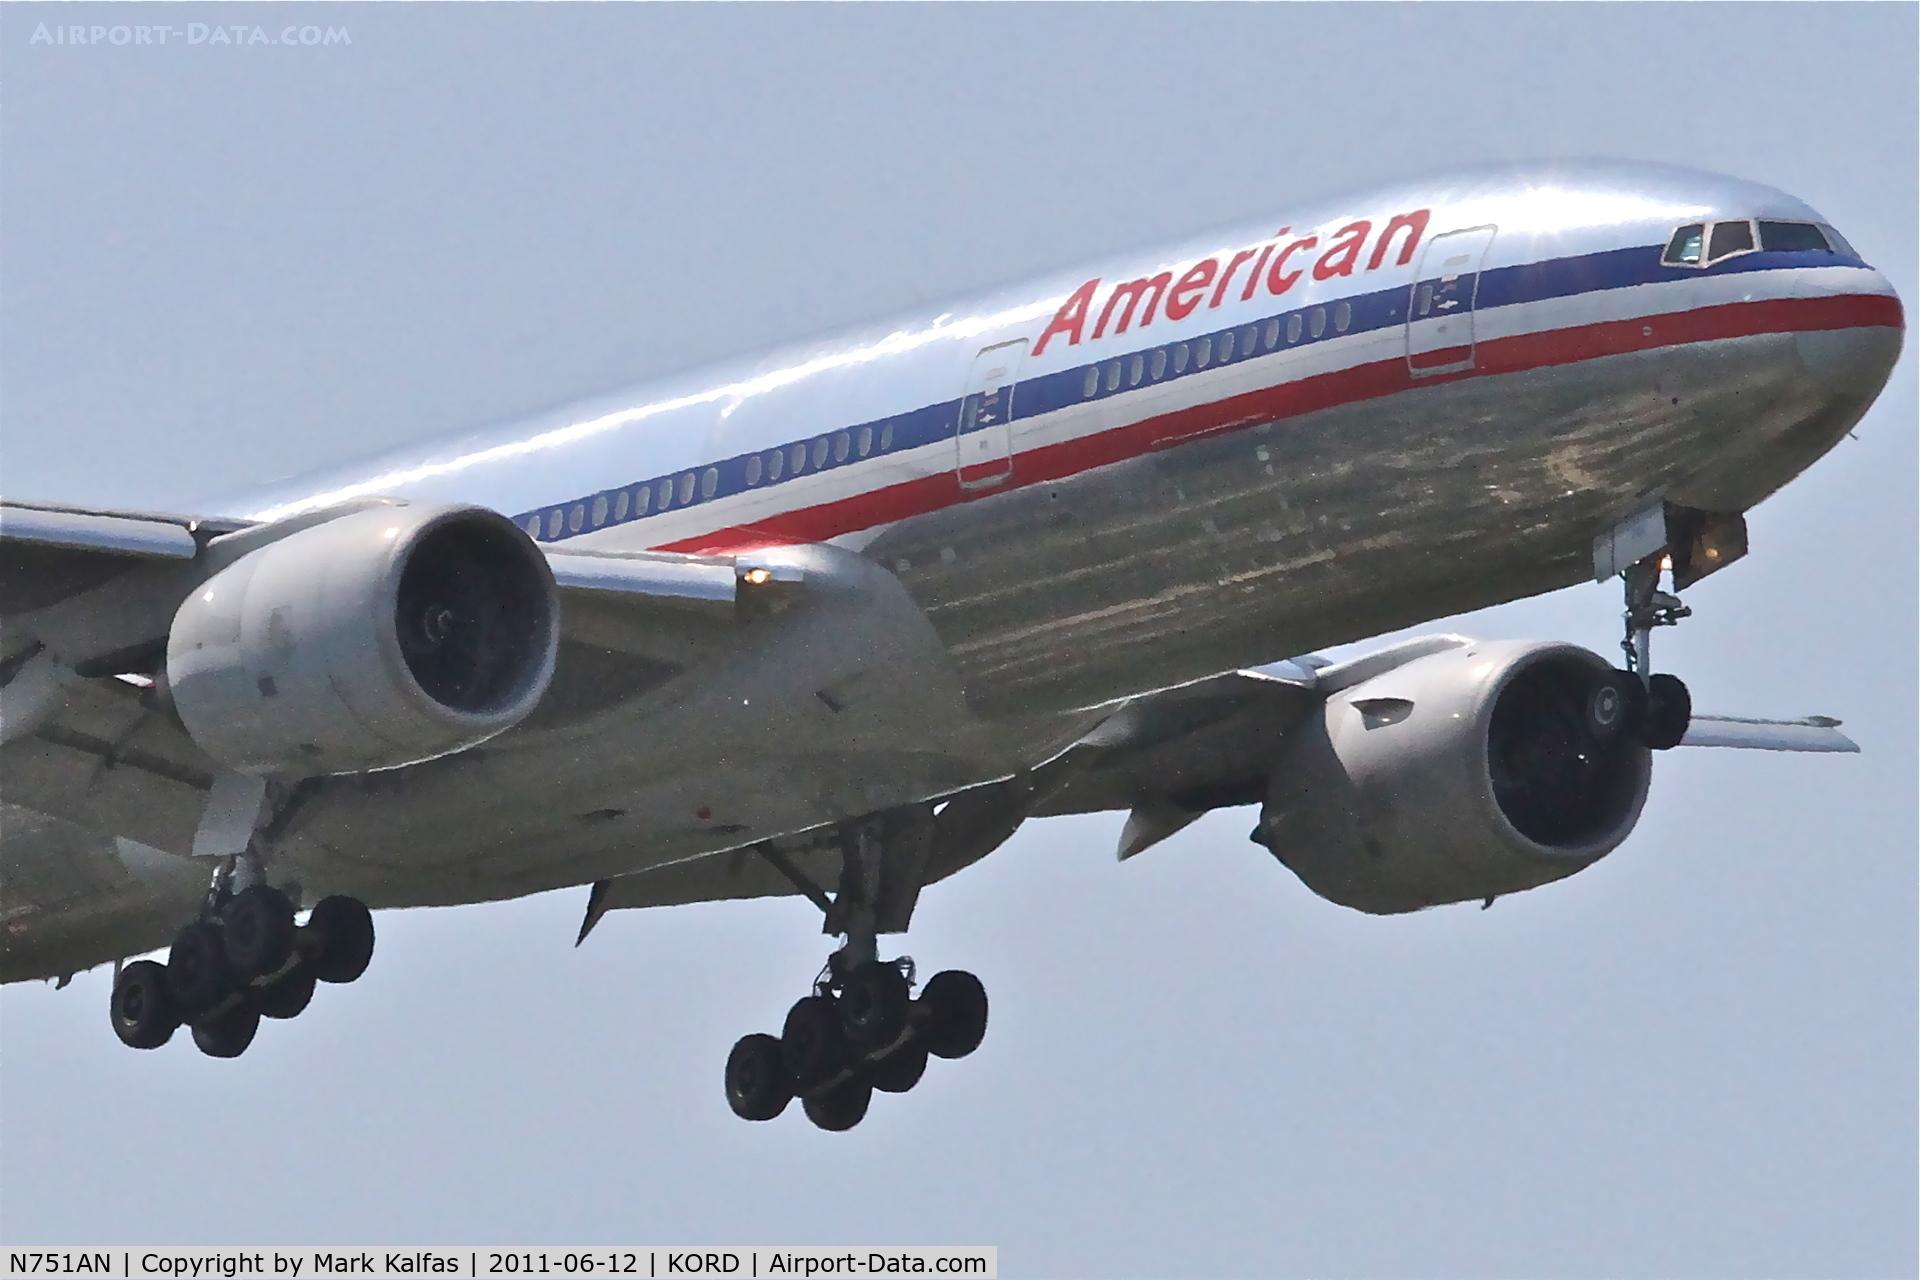 N751AN, 2001 Boeing 777-223 C/N 30798, American Airlines Boeing 777-223, AAL47 arriving from EGLL, RWY 10 approach KORD.